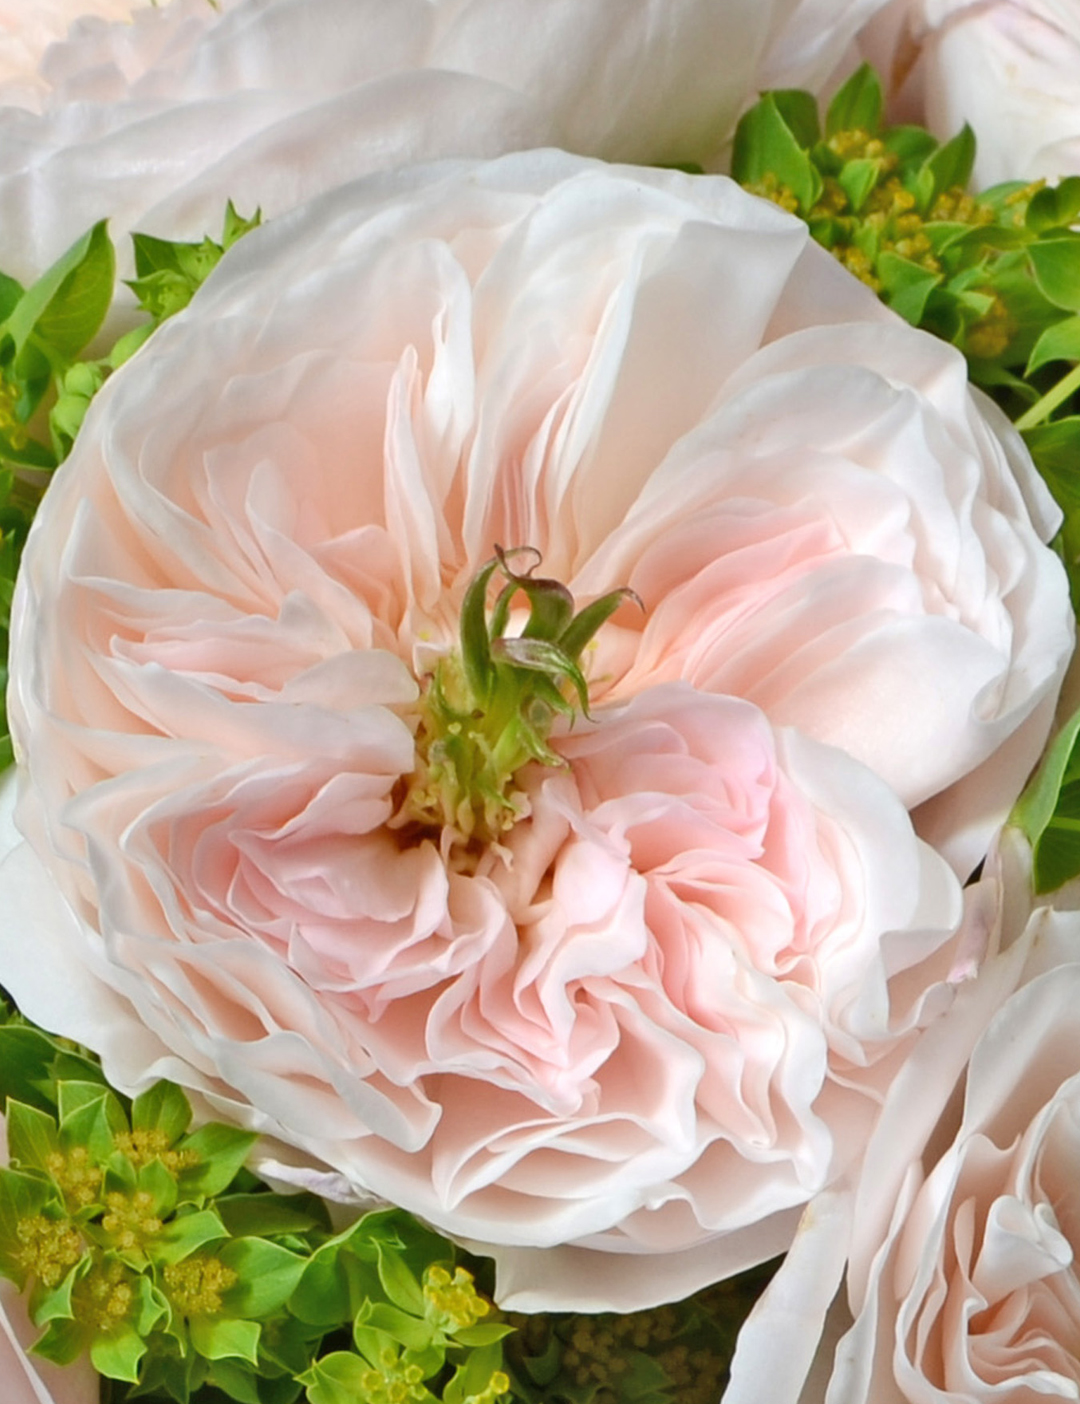 David Austin Charity Rose Open Bloom